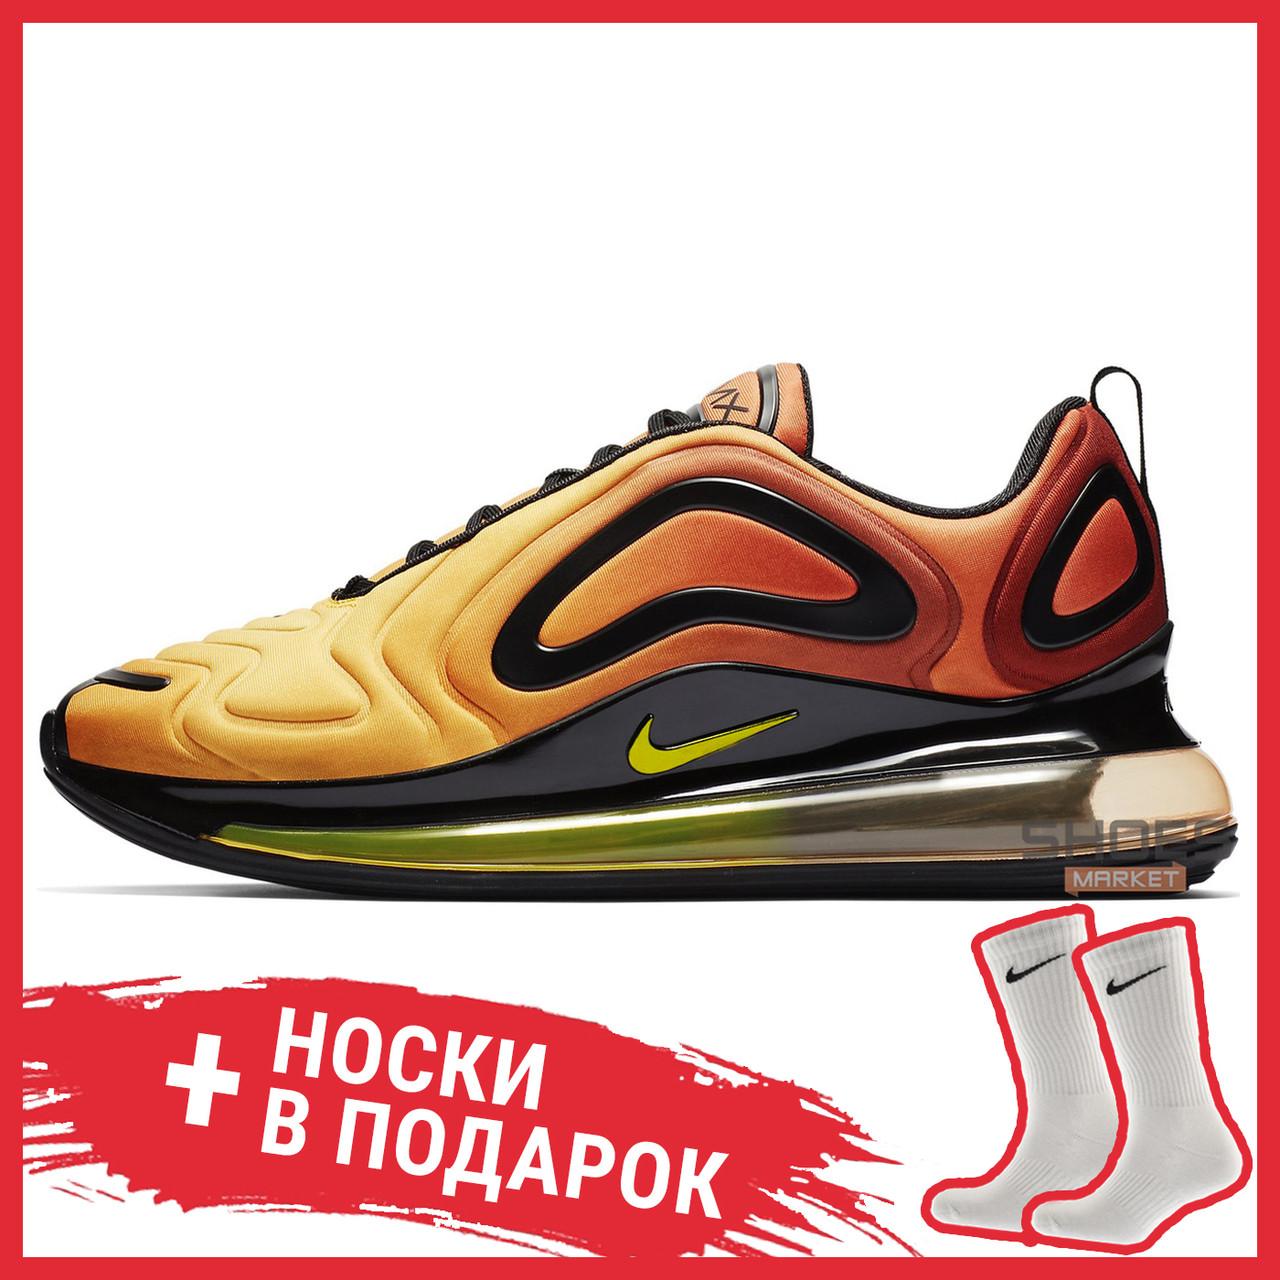 Мужские кроссовки Nike Air Max 720 Sunrise AO2924-800, Найк Аир Макс 720